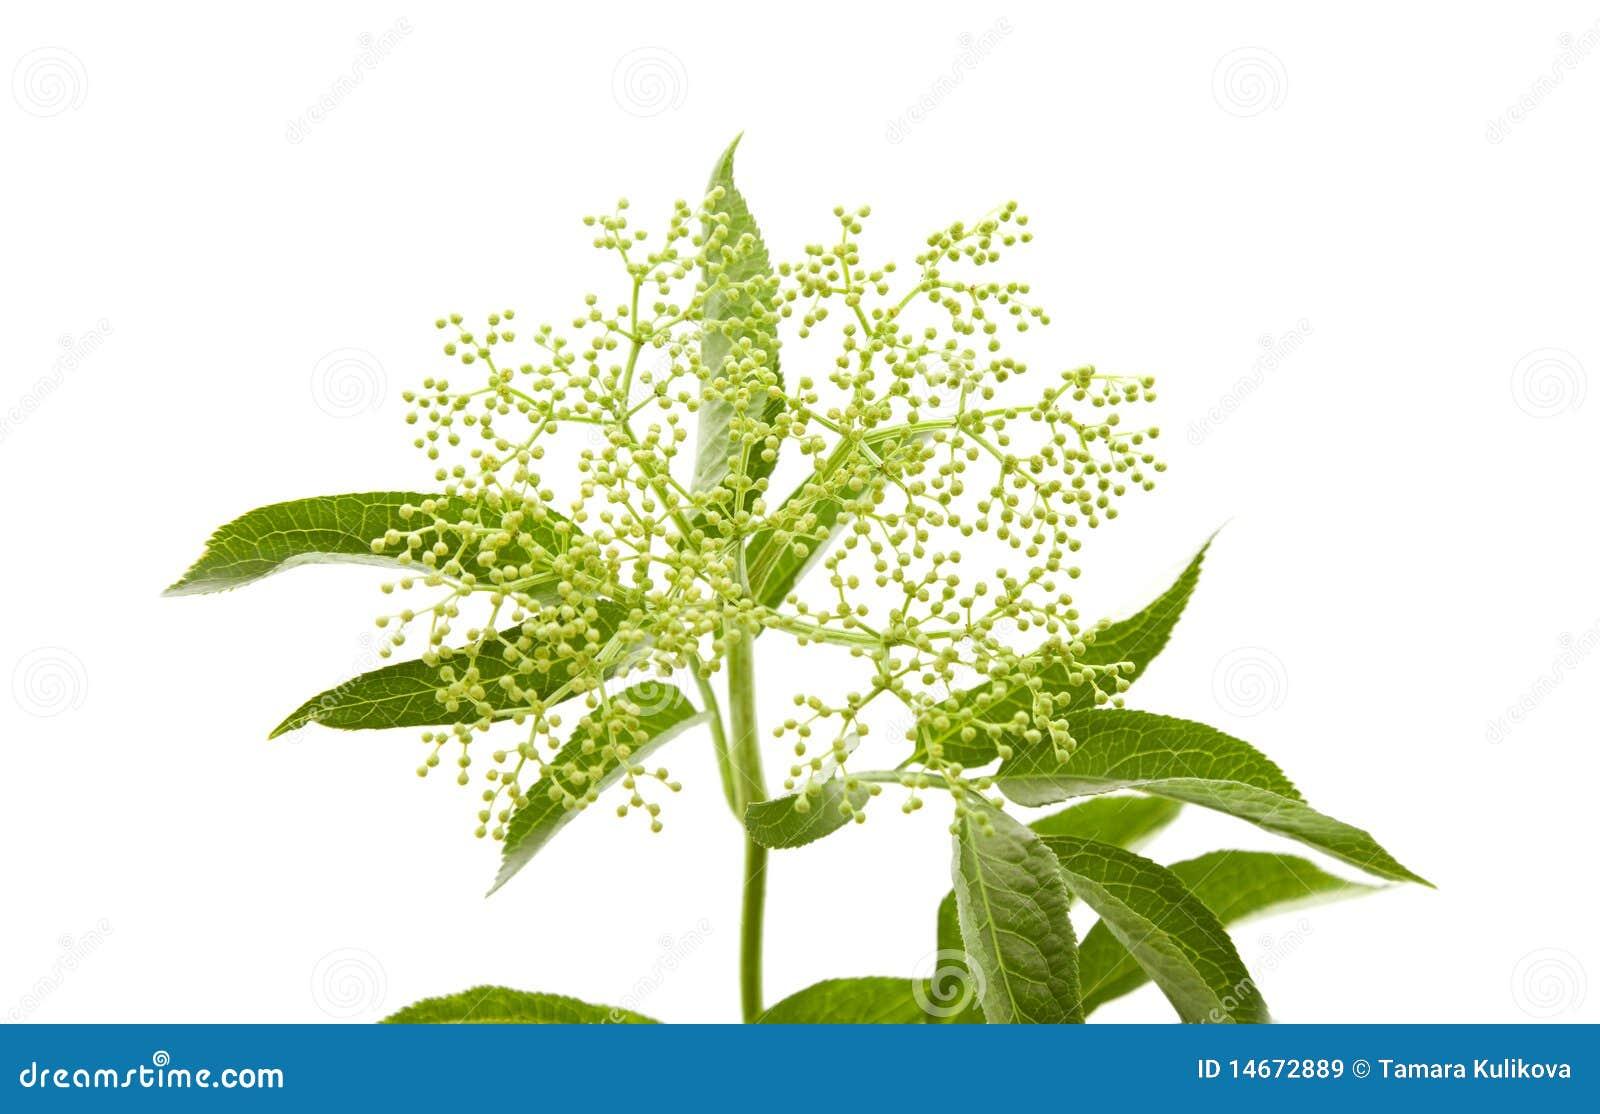 Download Black Elder, stock image. Image of flower, botany, isolated - 14672889